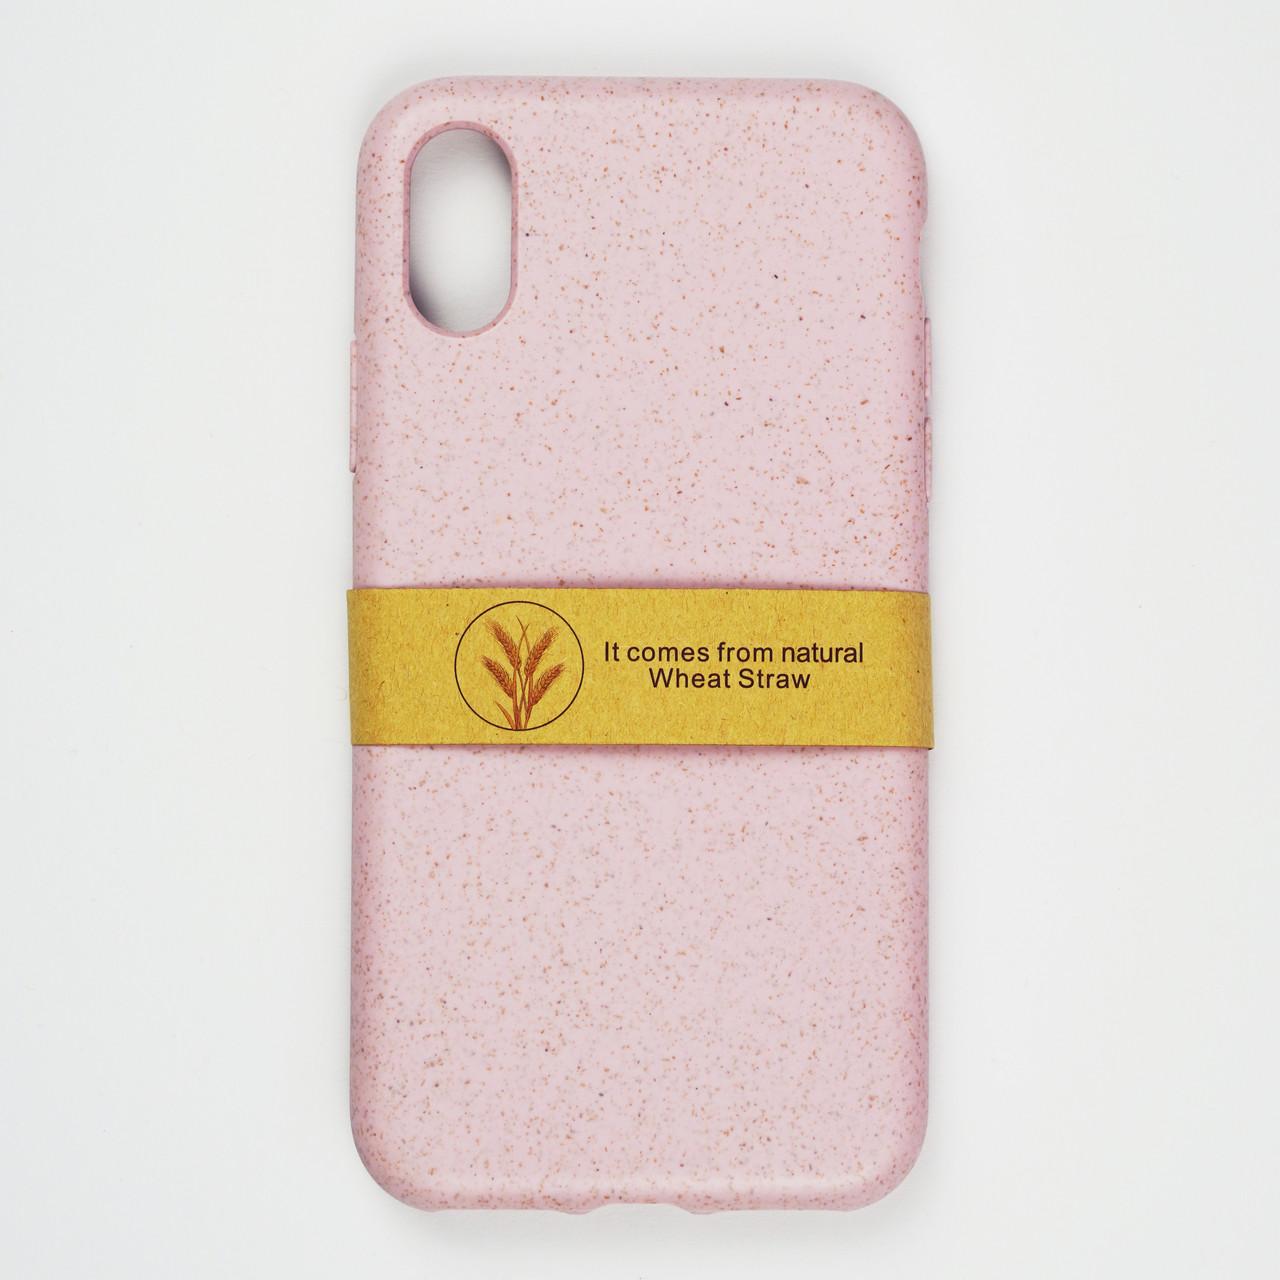 Биоразлагаемый чехол ECO Wheat Straw для iPhone X / Xs Pink